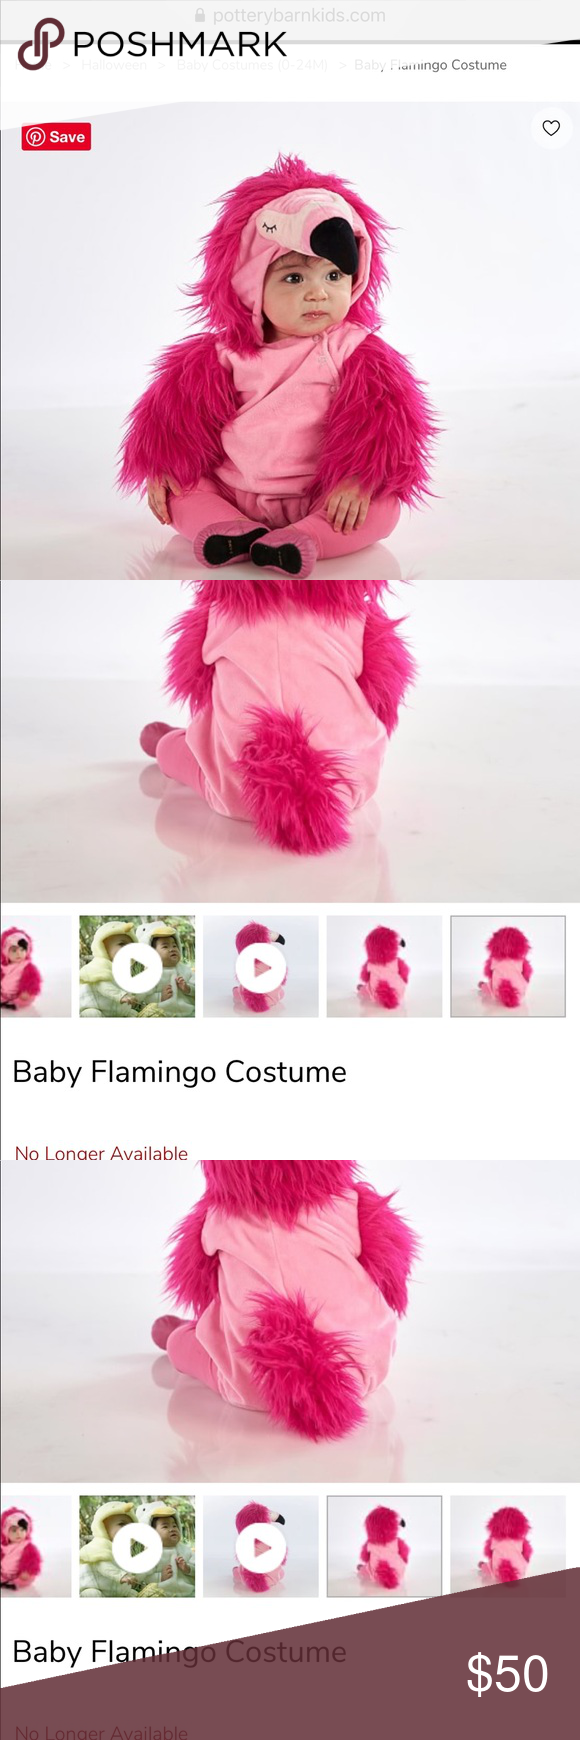 Baby Flamingo Costume NWT Pottery barn kids costume